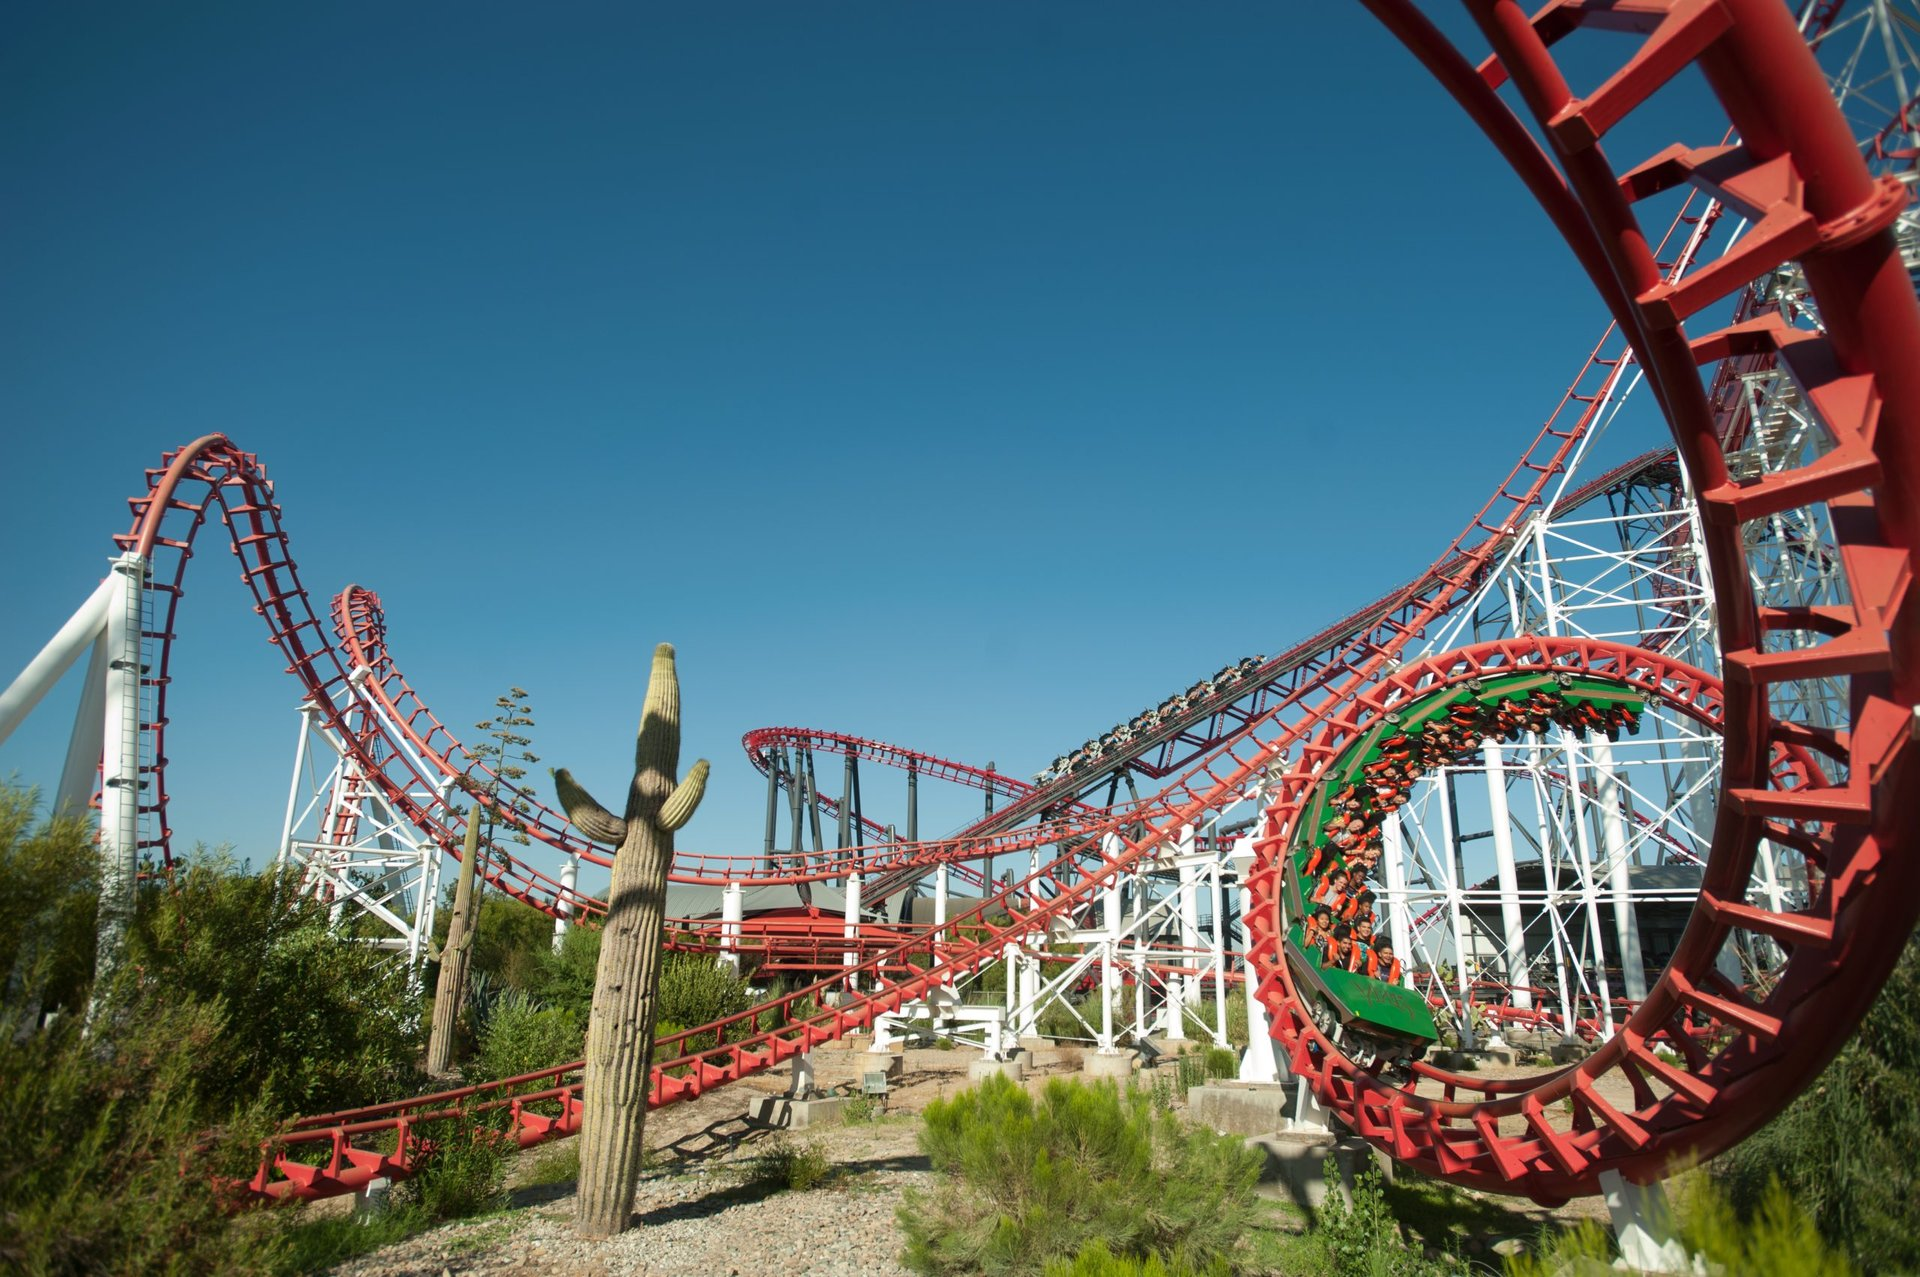 This arrow dynamics 4th dimension roller coaster ope. Viper Six Flags Magic Mountain